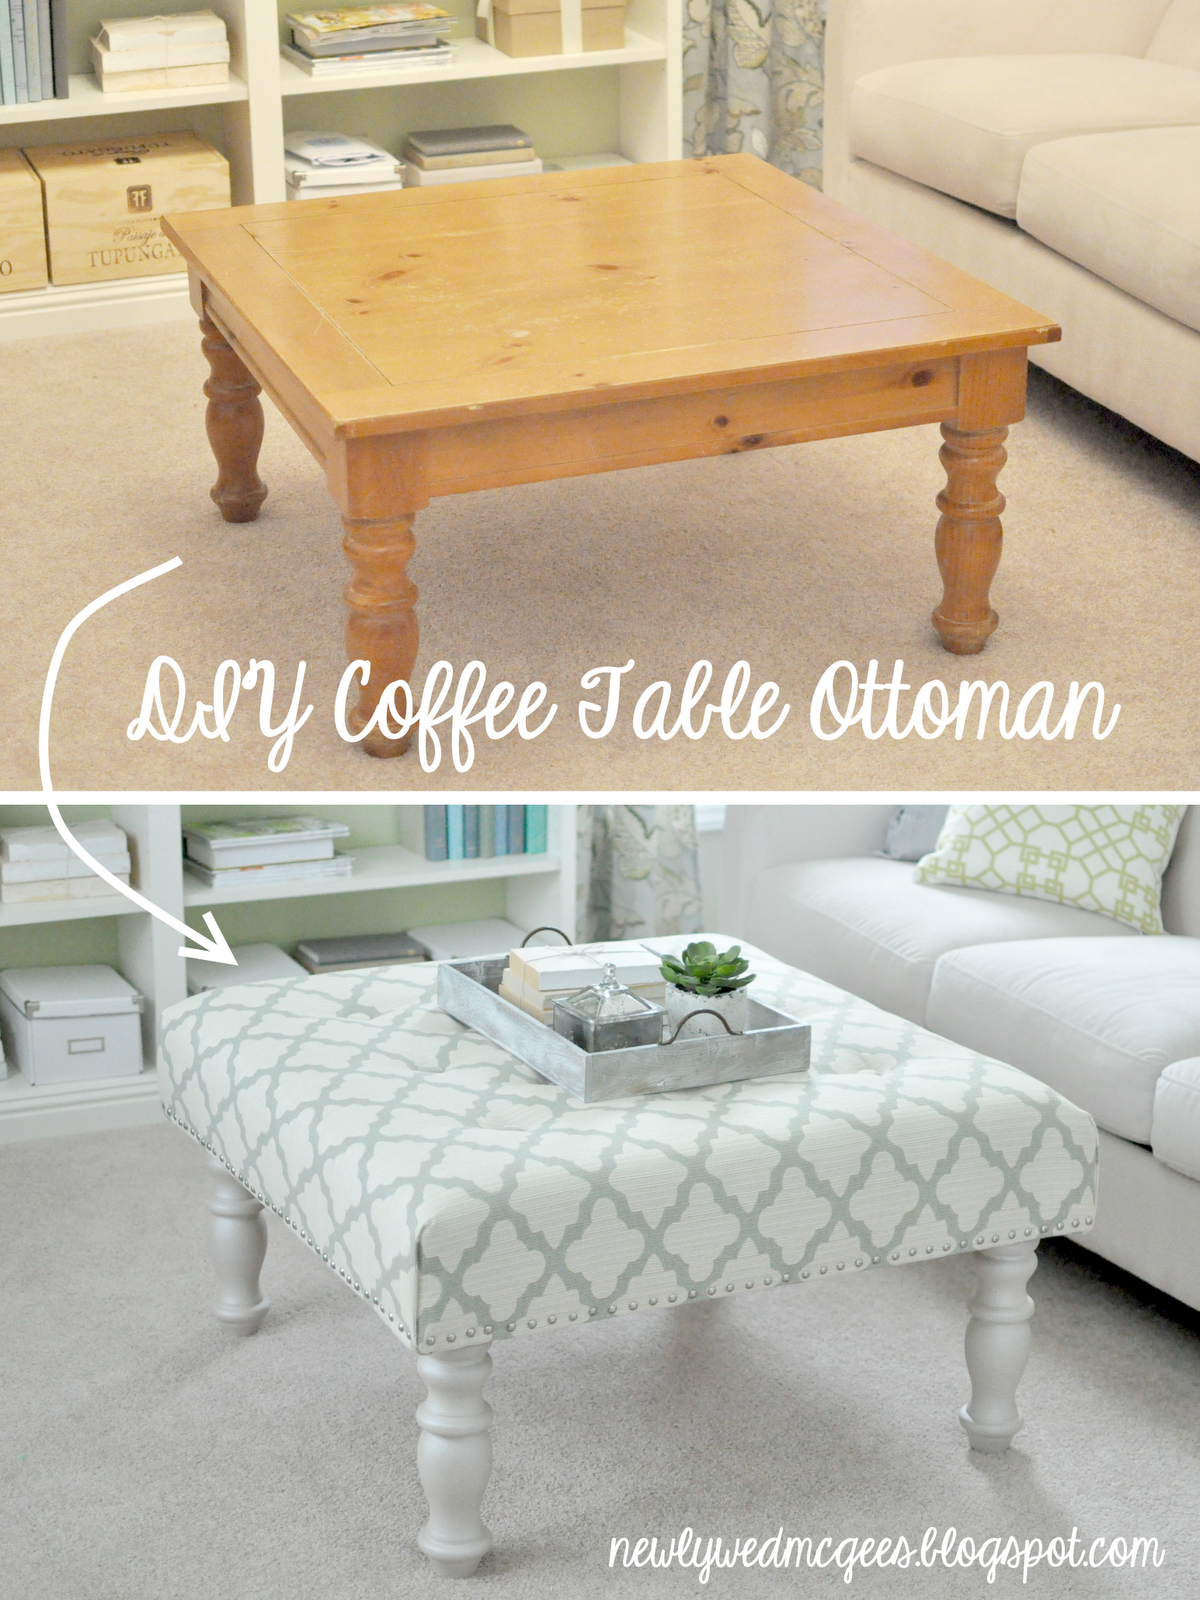 Top 25 Diy Decorating Ideas Under 100 Furniture Makeover Diy